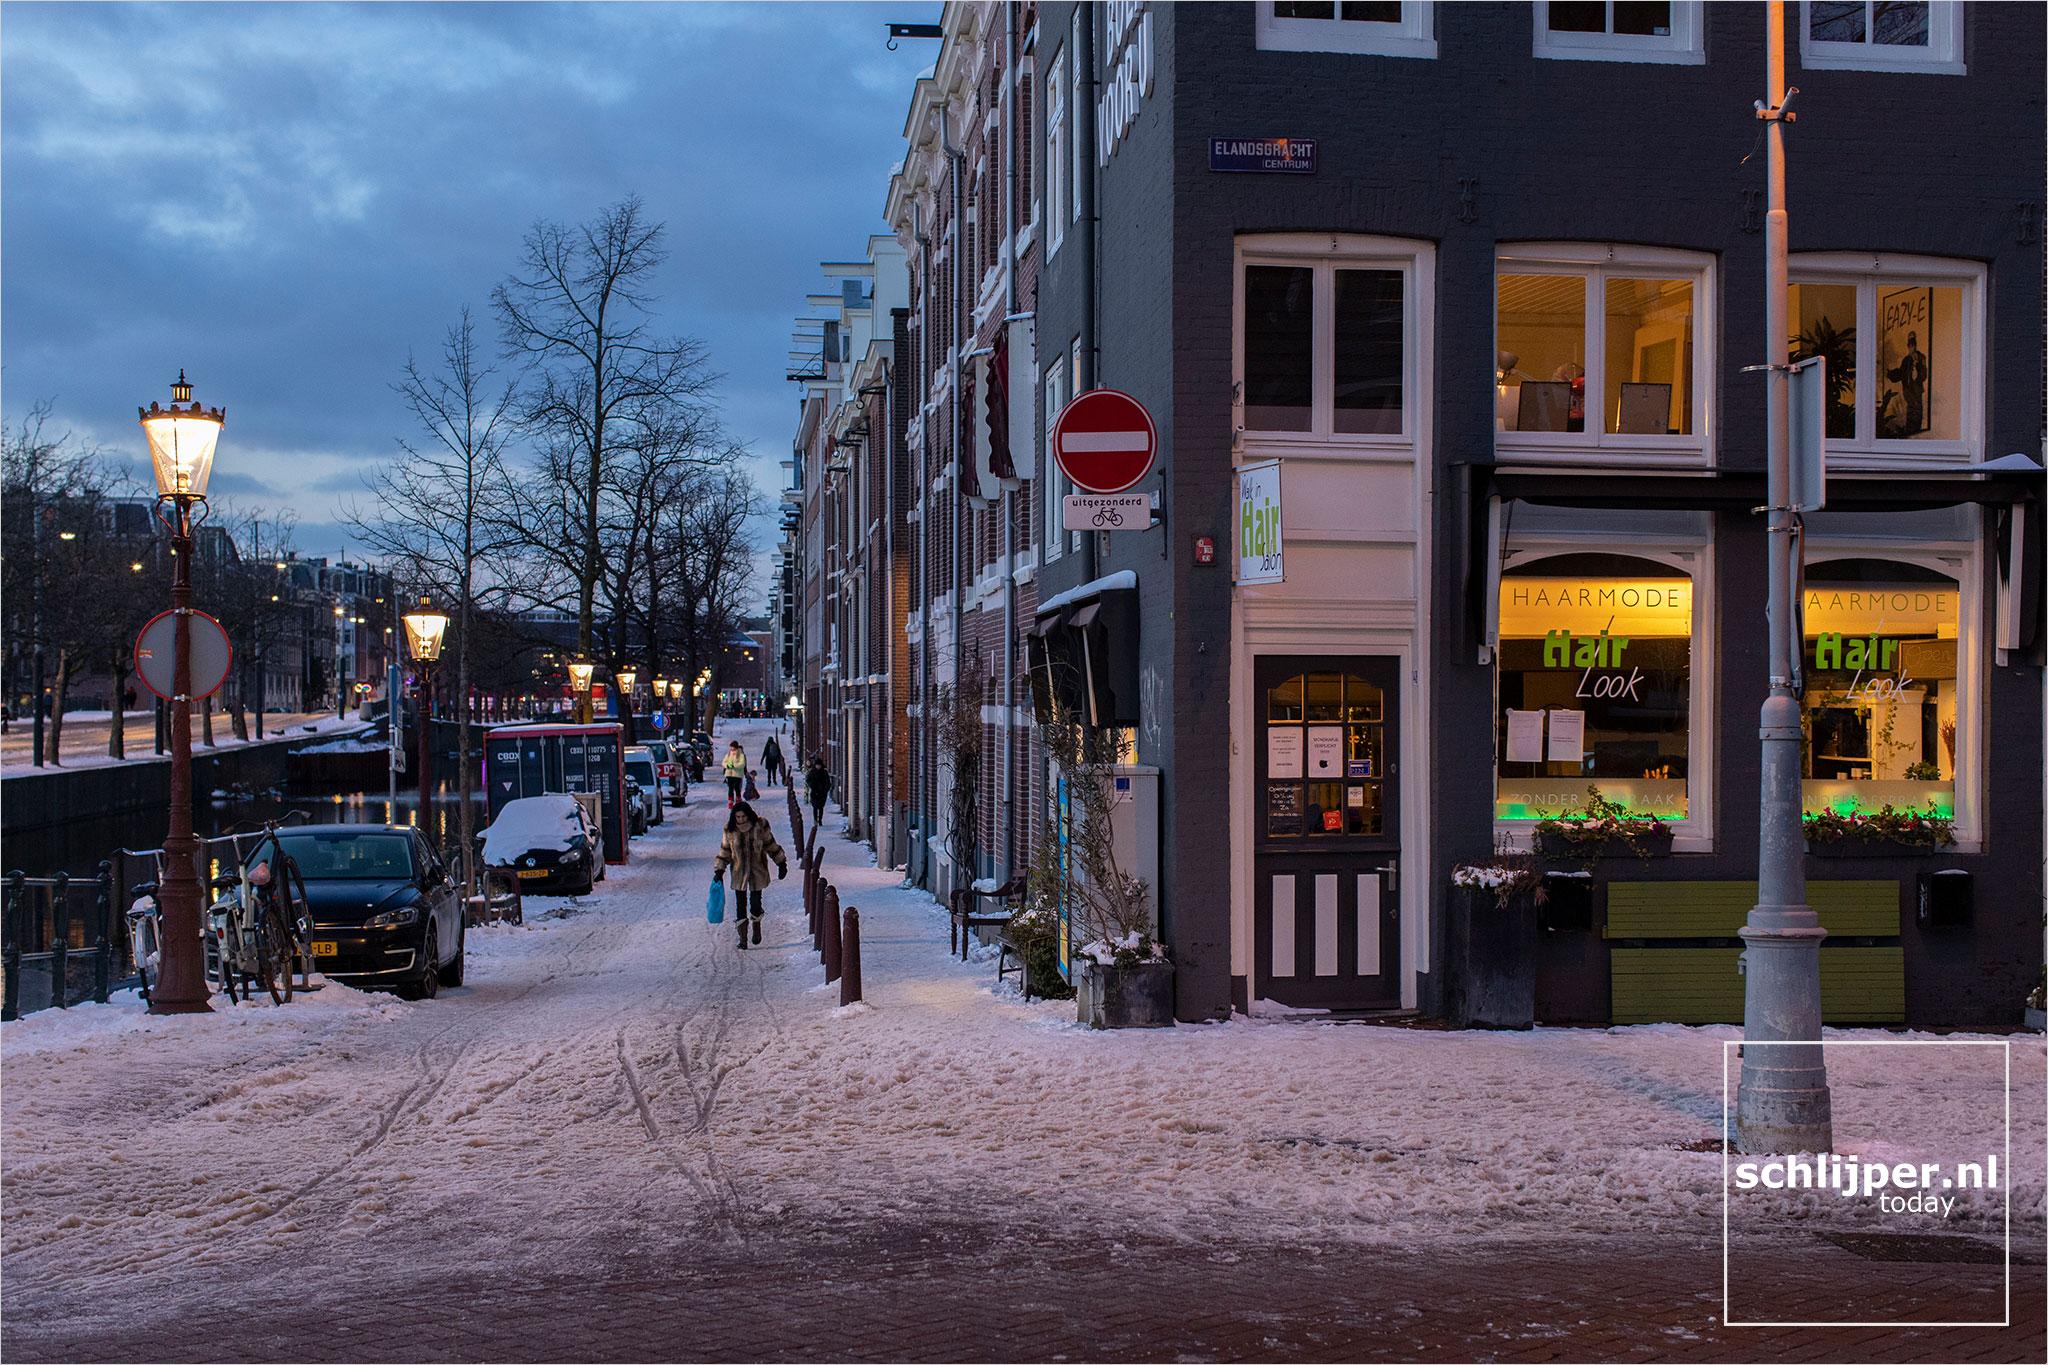 The Netherlands, Amsterdam, 9 februari 2021